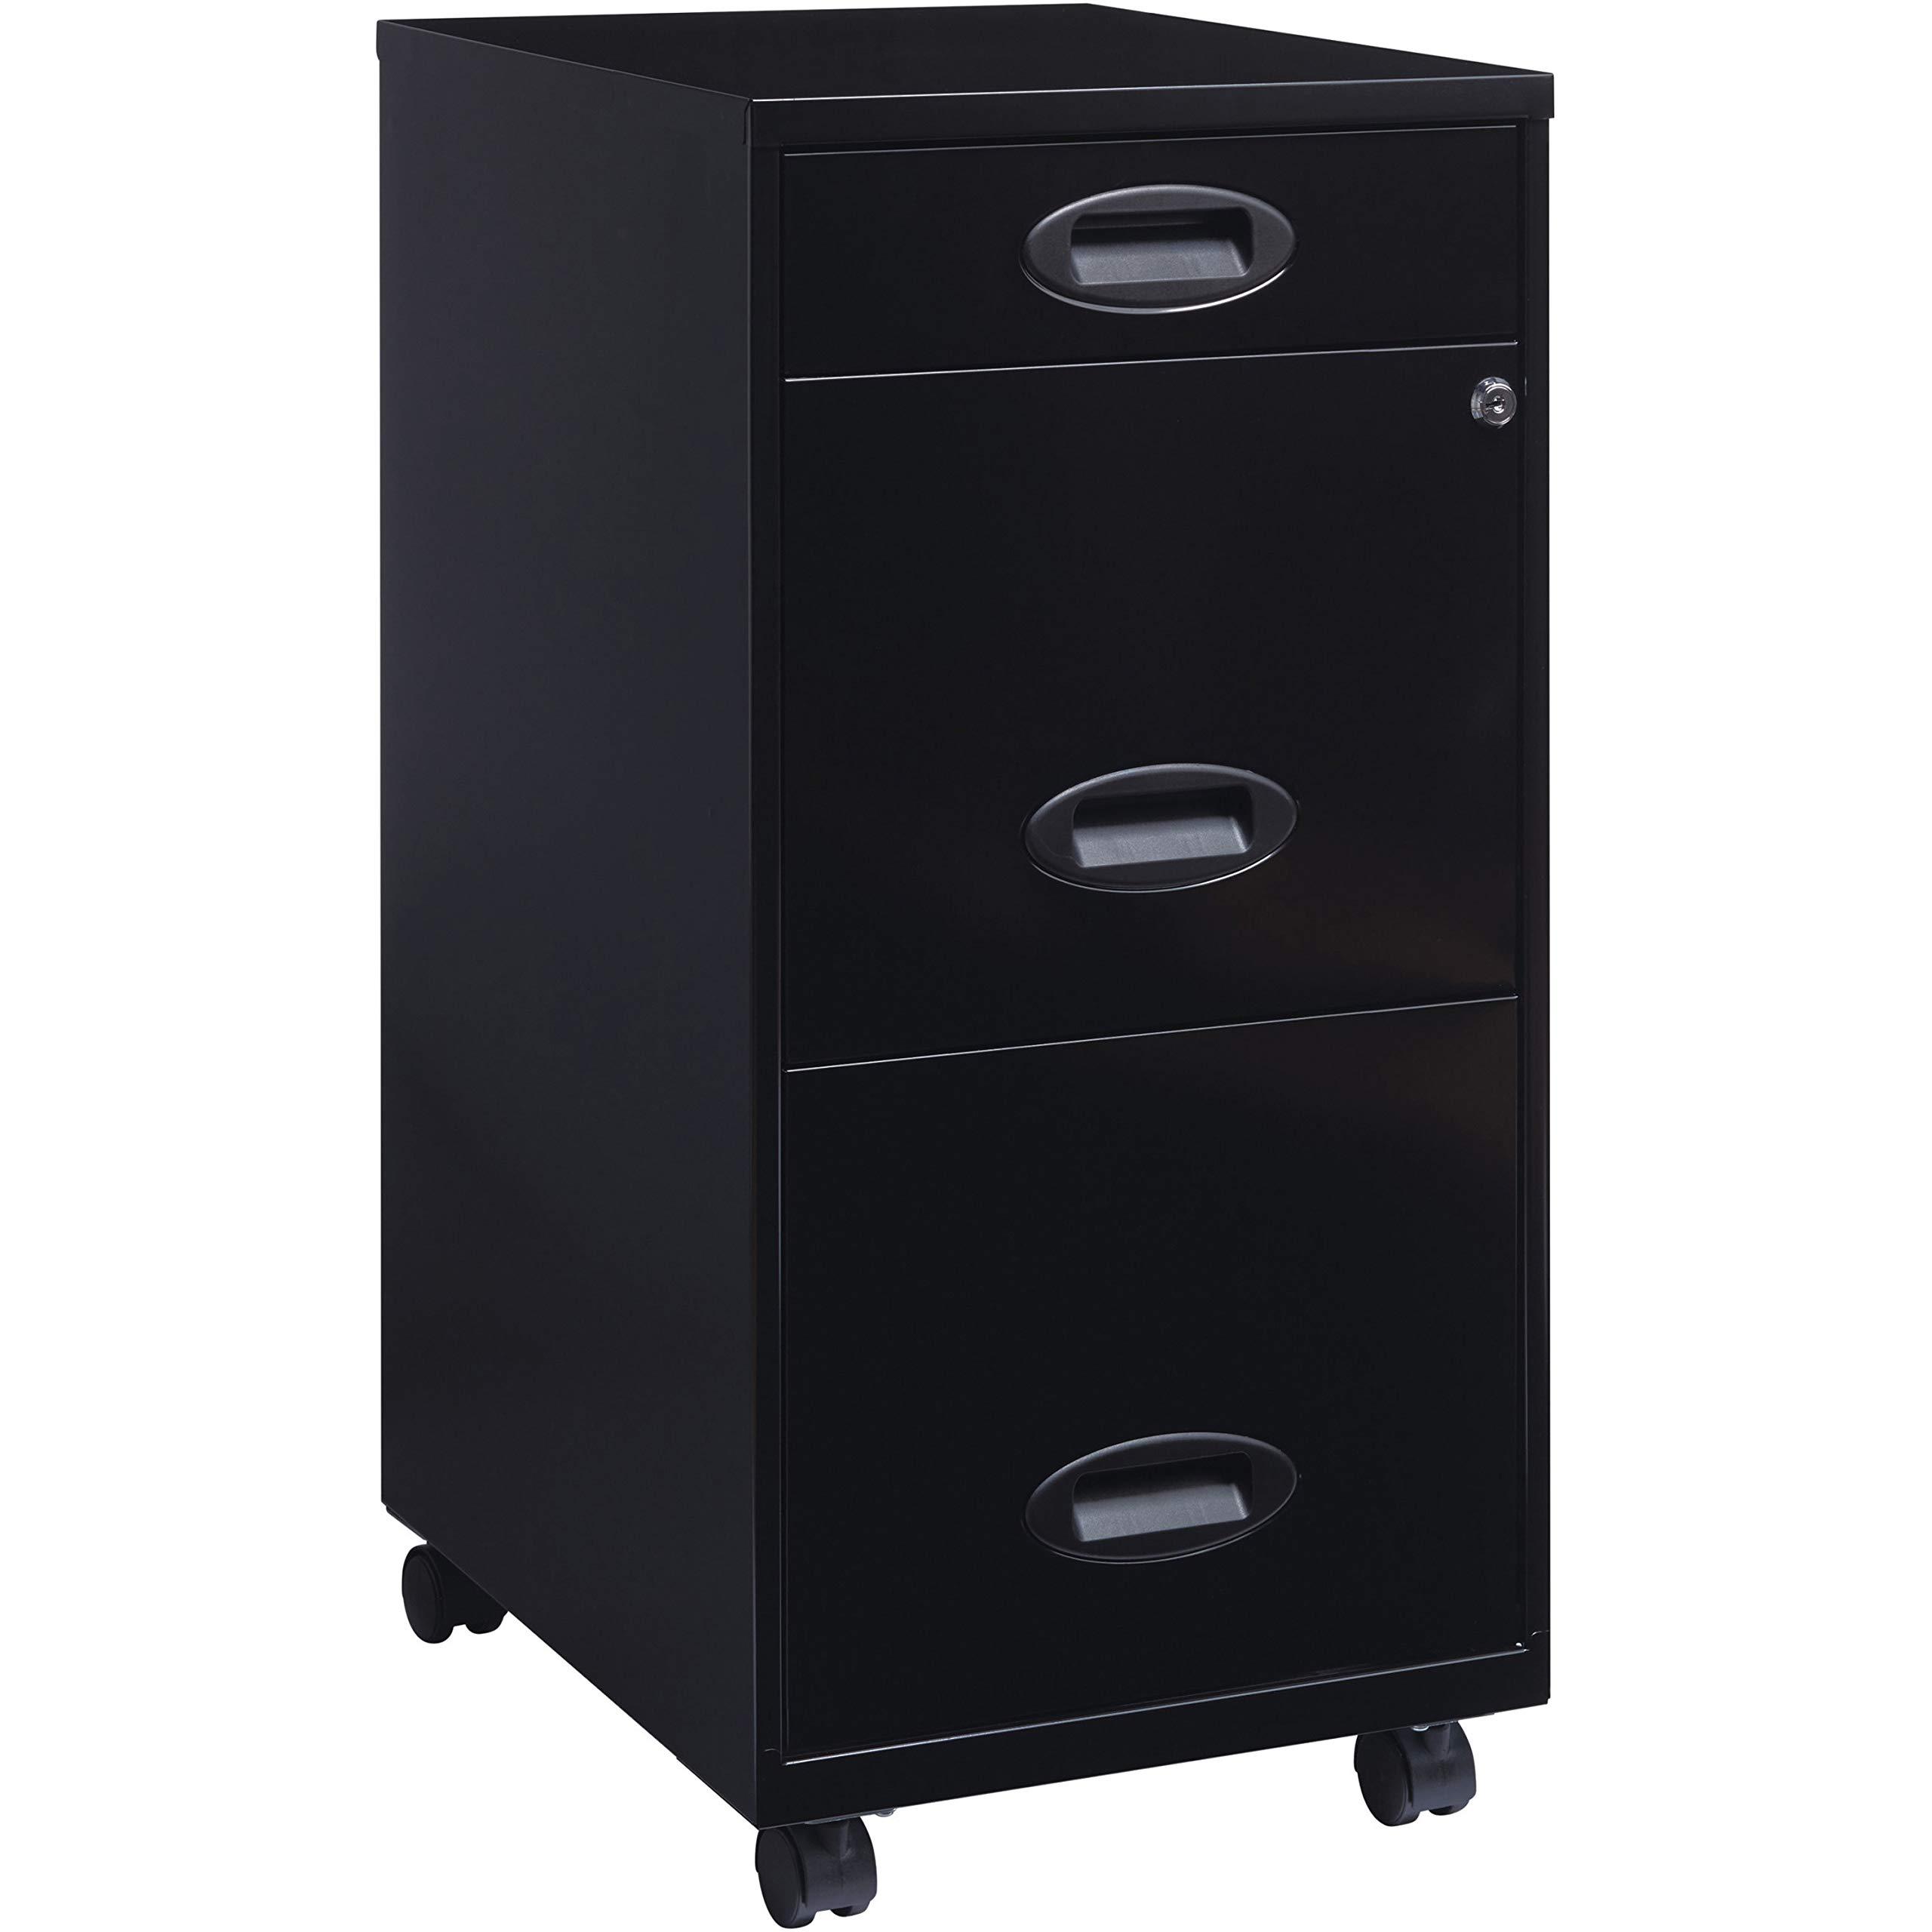 Lorell LLR17427 SOHO Mobile Cabinet, Black